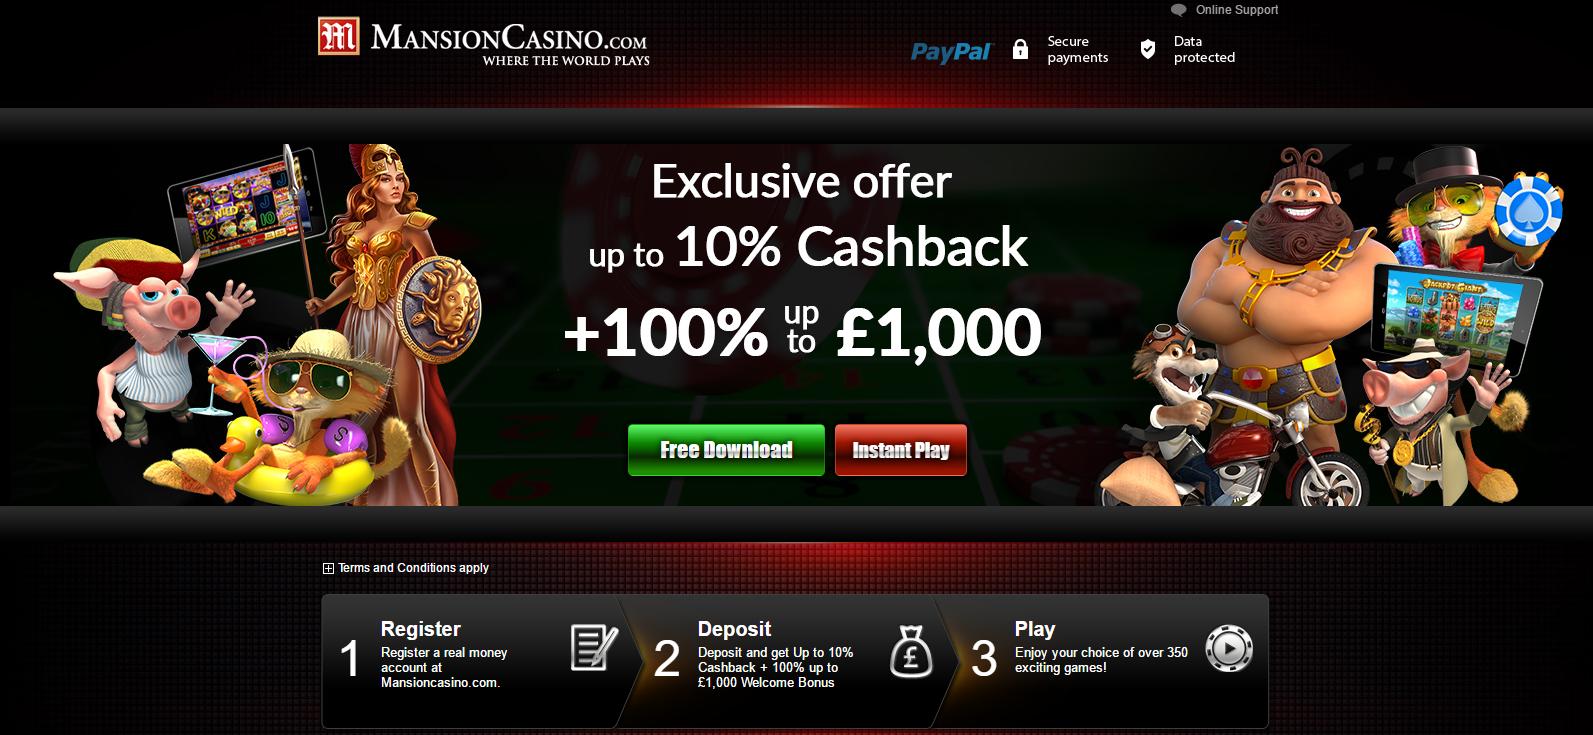 Mansion casino 10 free